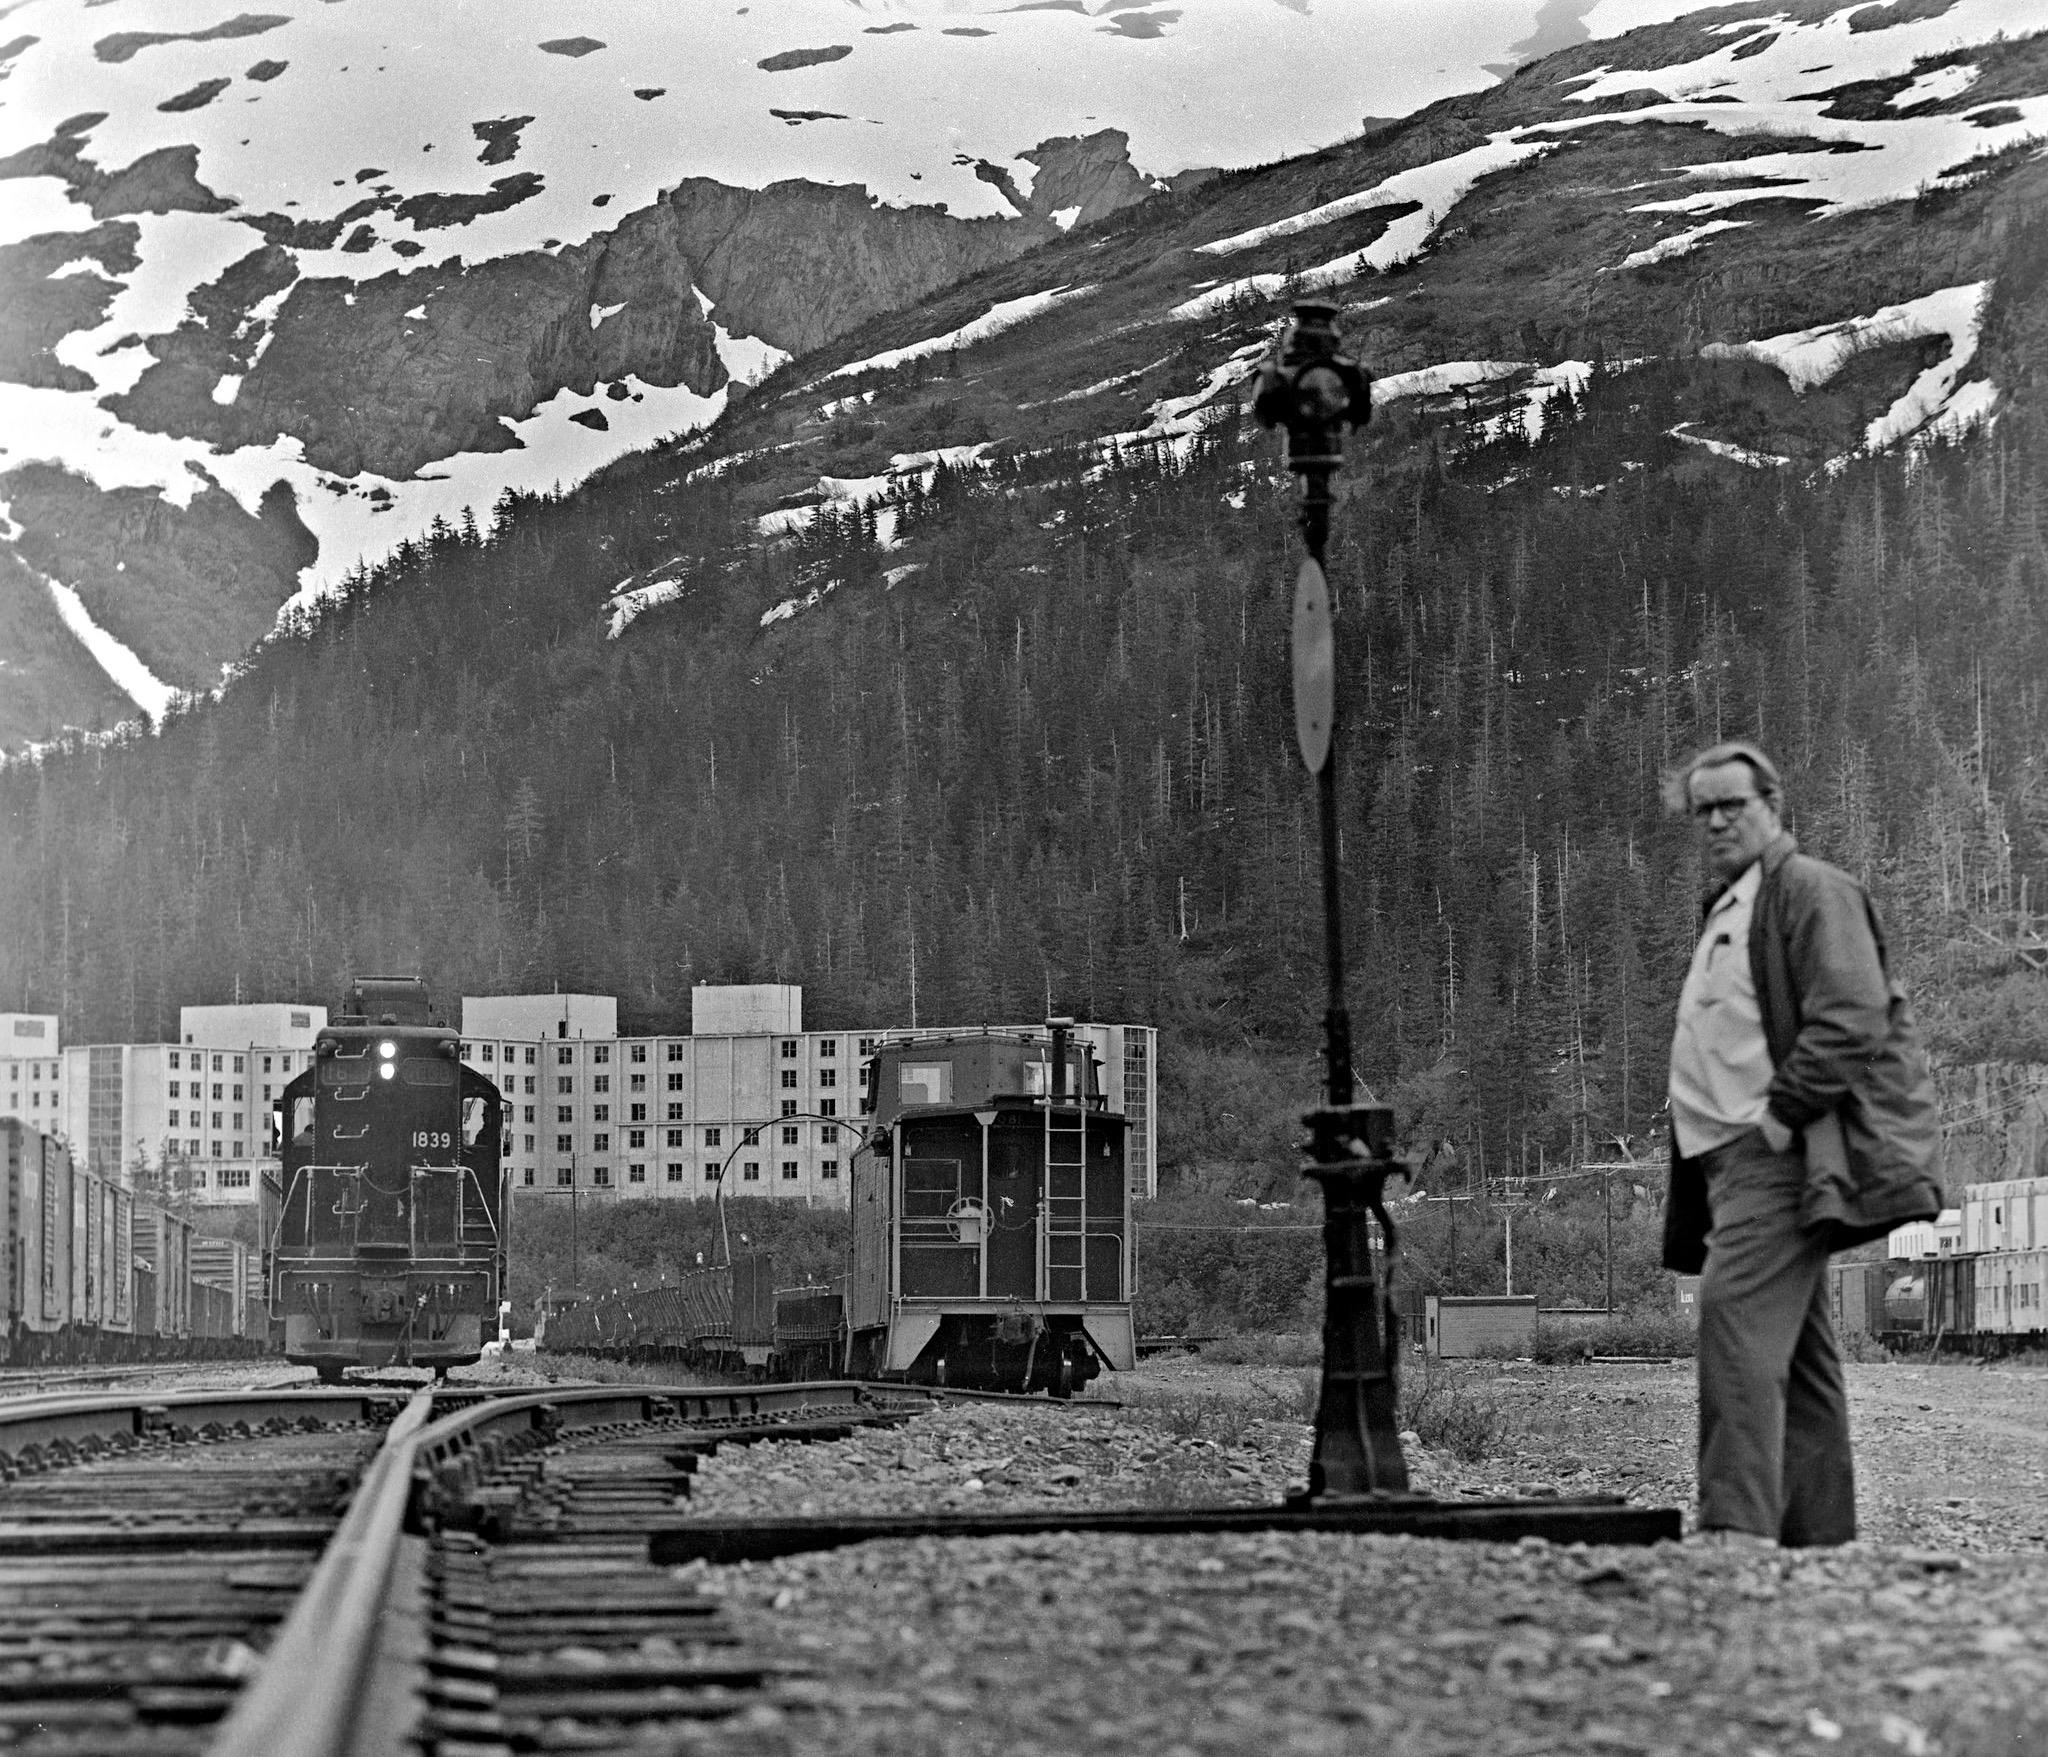 Grandpa Gene in Whittier, Alaska (courtesy of the Alaska Railroad)